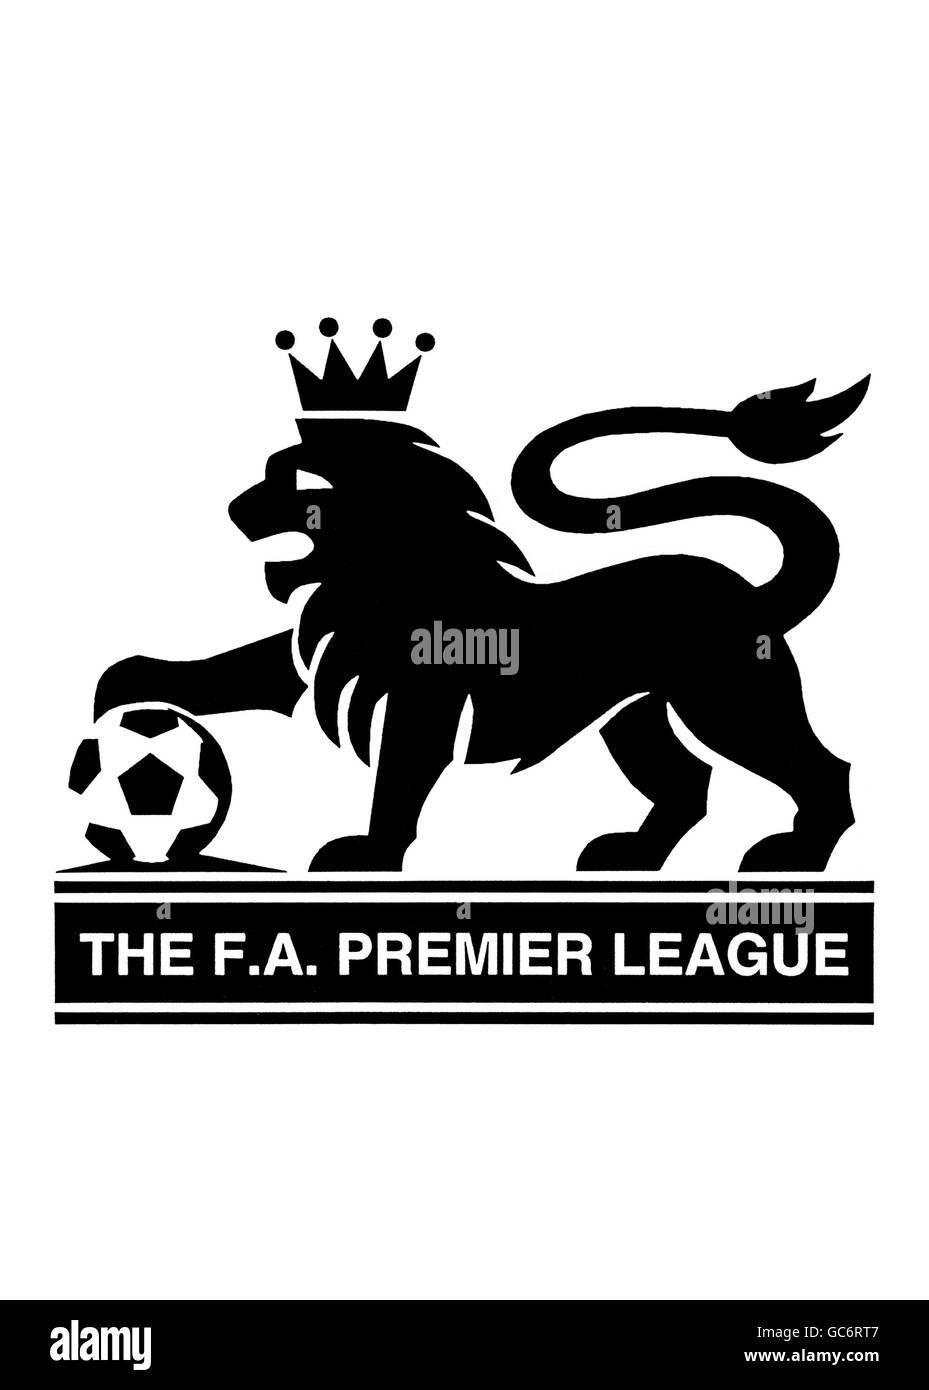 Soccer Fa Premier League Logo Stock Photo Alamy